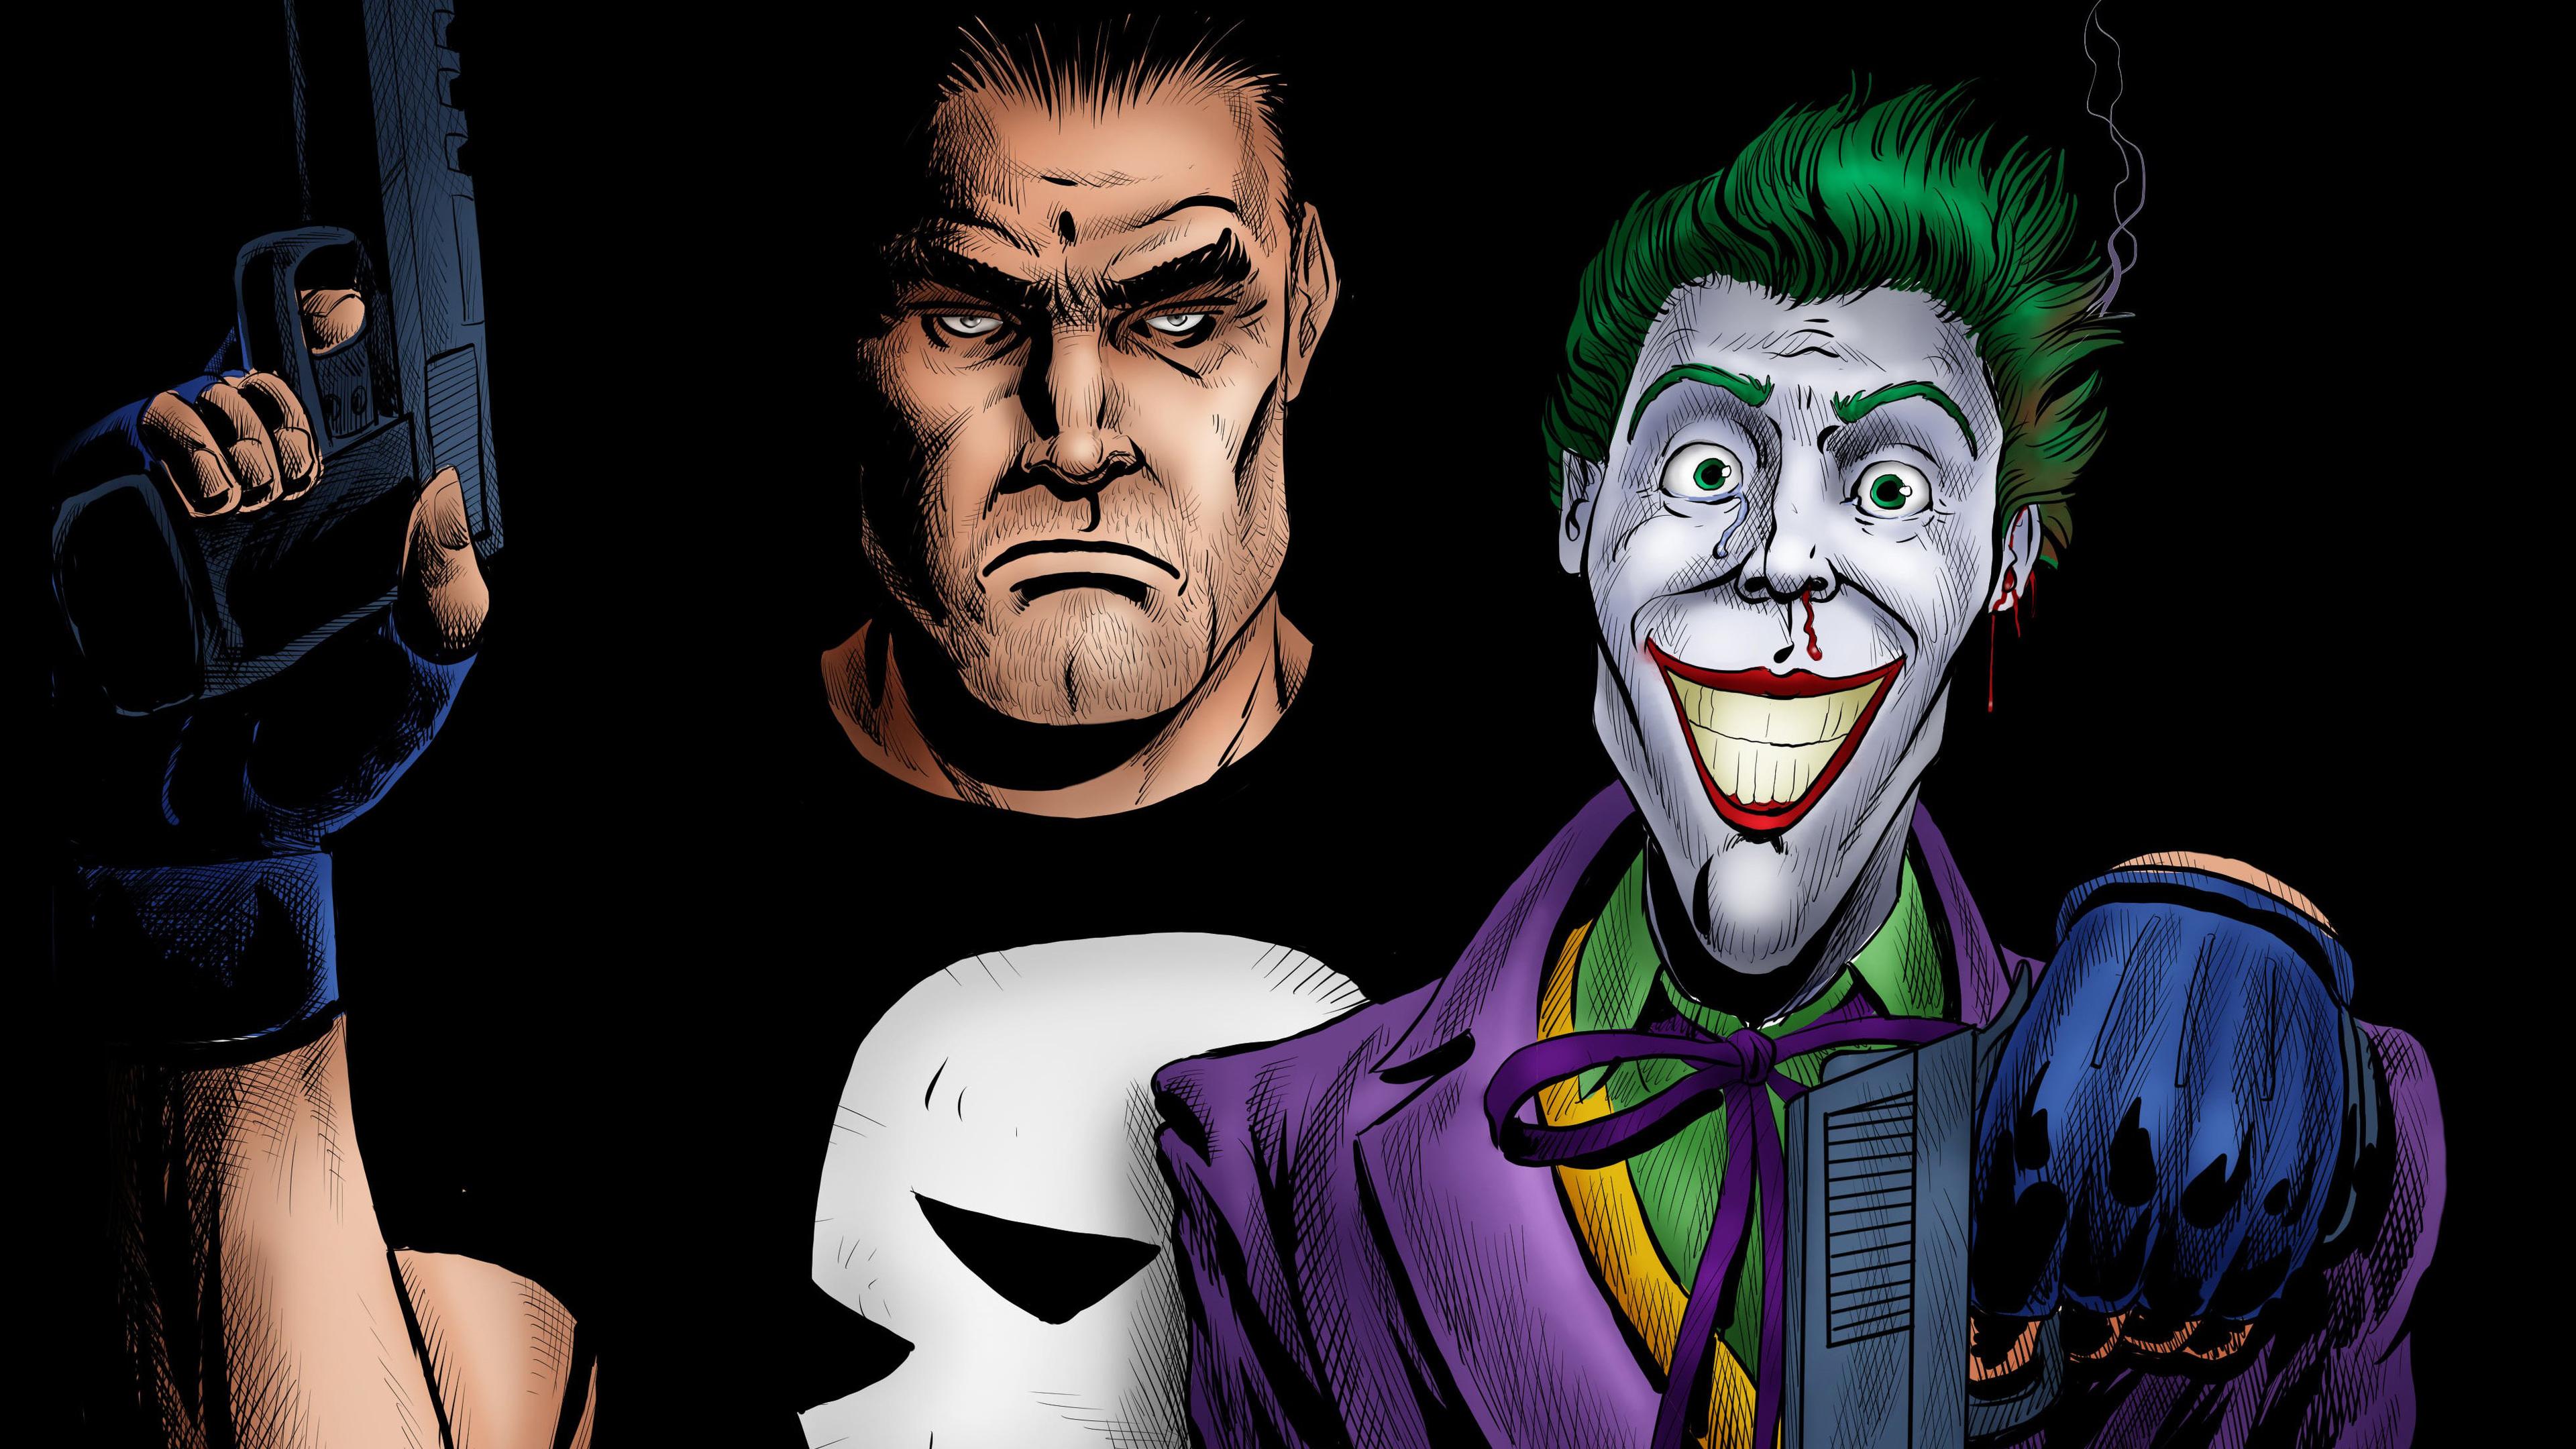 punisher and joker artwork 4k 1536520313 - Punisher And Joker Artwork 4k - punisher wallpapers, joker wallpapers, hd-wallpapers, artwork wallpapers, 4k-wallpapers